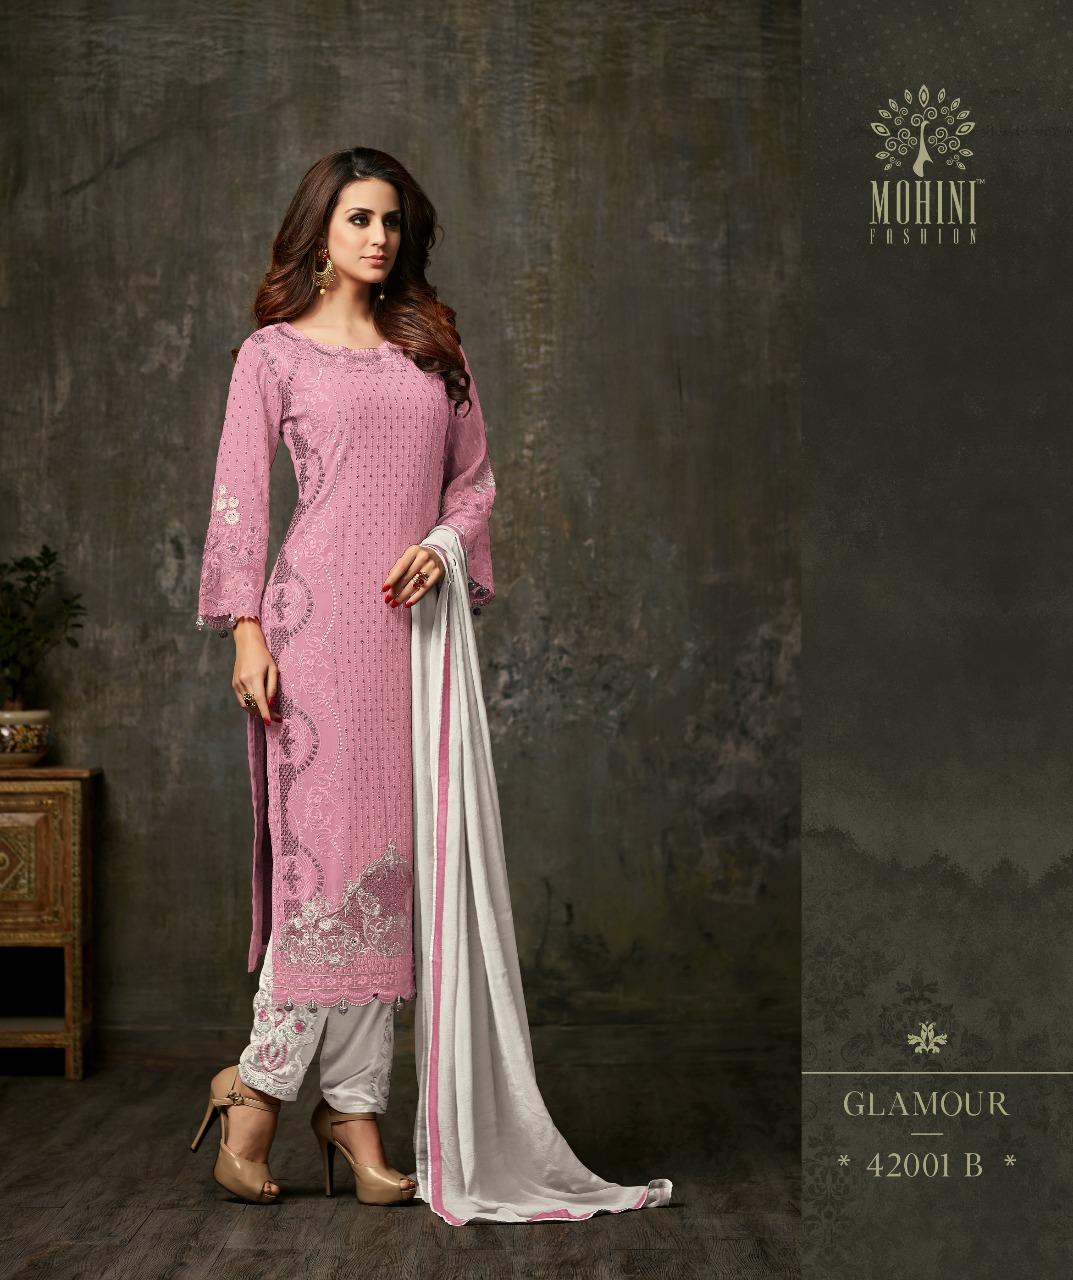 Mohini Fashion Glamour Vol 42 42001B LIGHT PURPLE